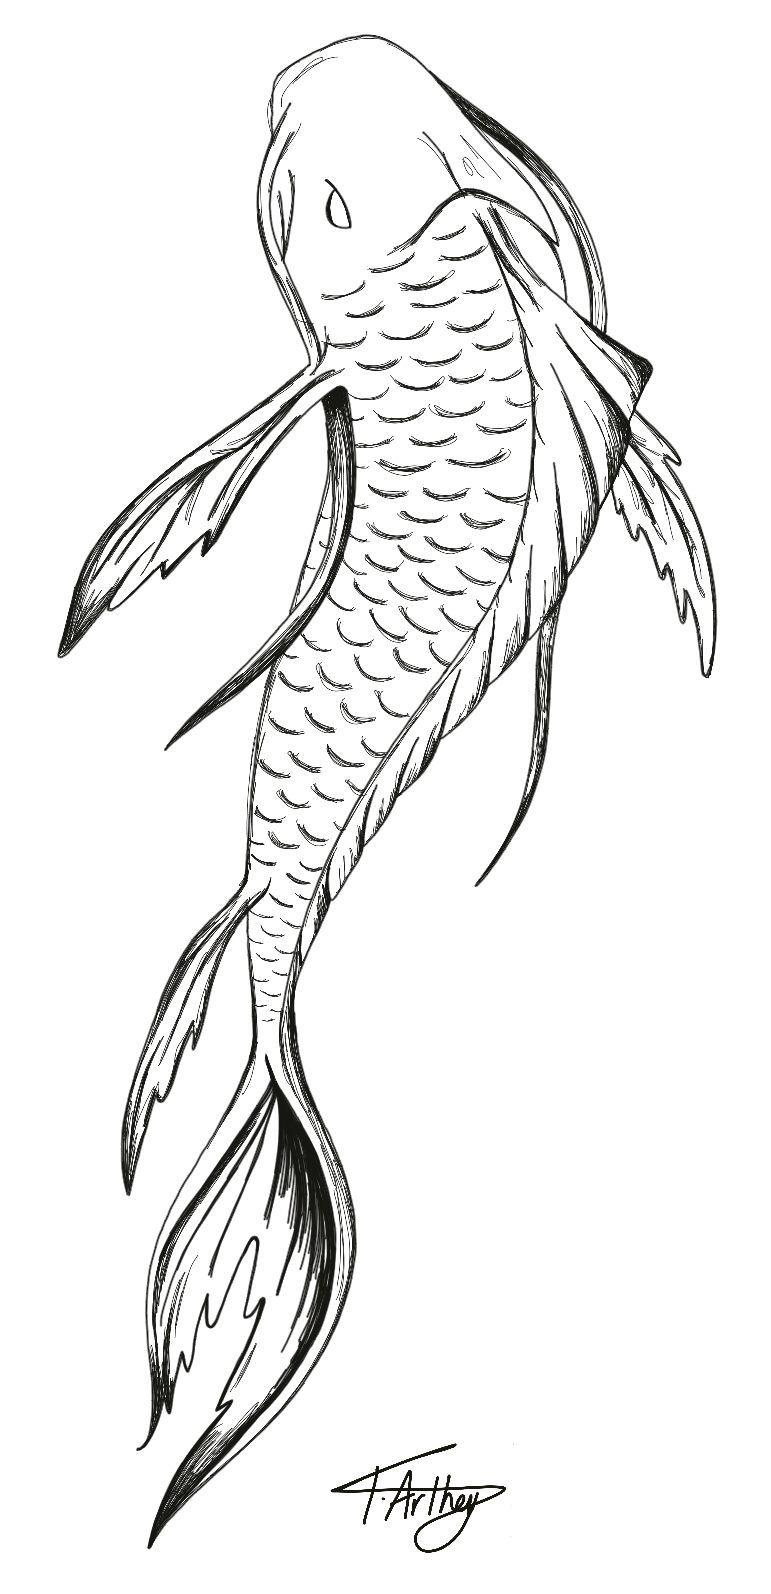 Fish Tattoo Design In 2020 Koi Fish Drawing Fish Drawings Japanese Fish Tattoo